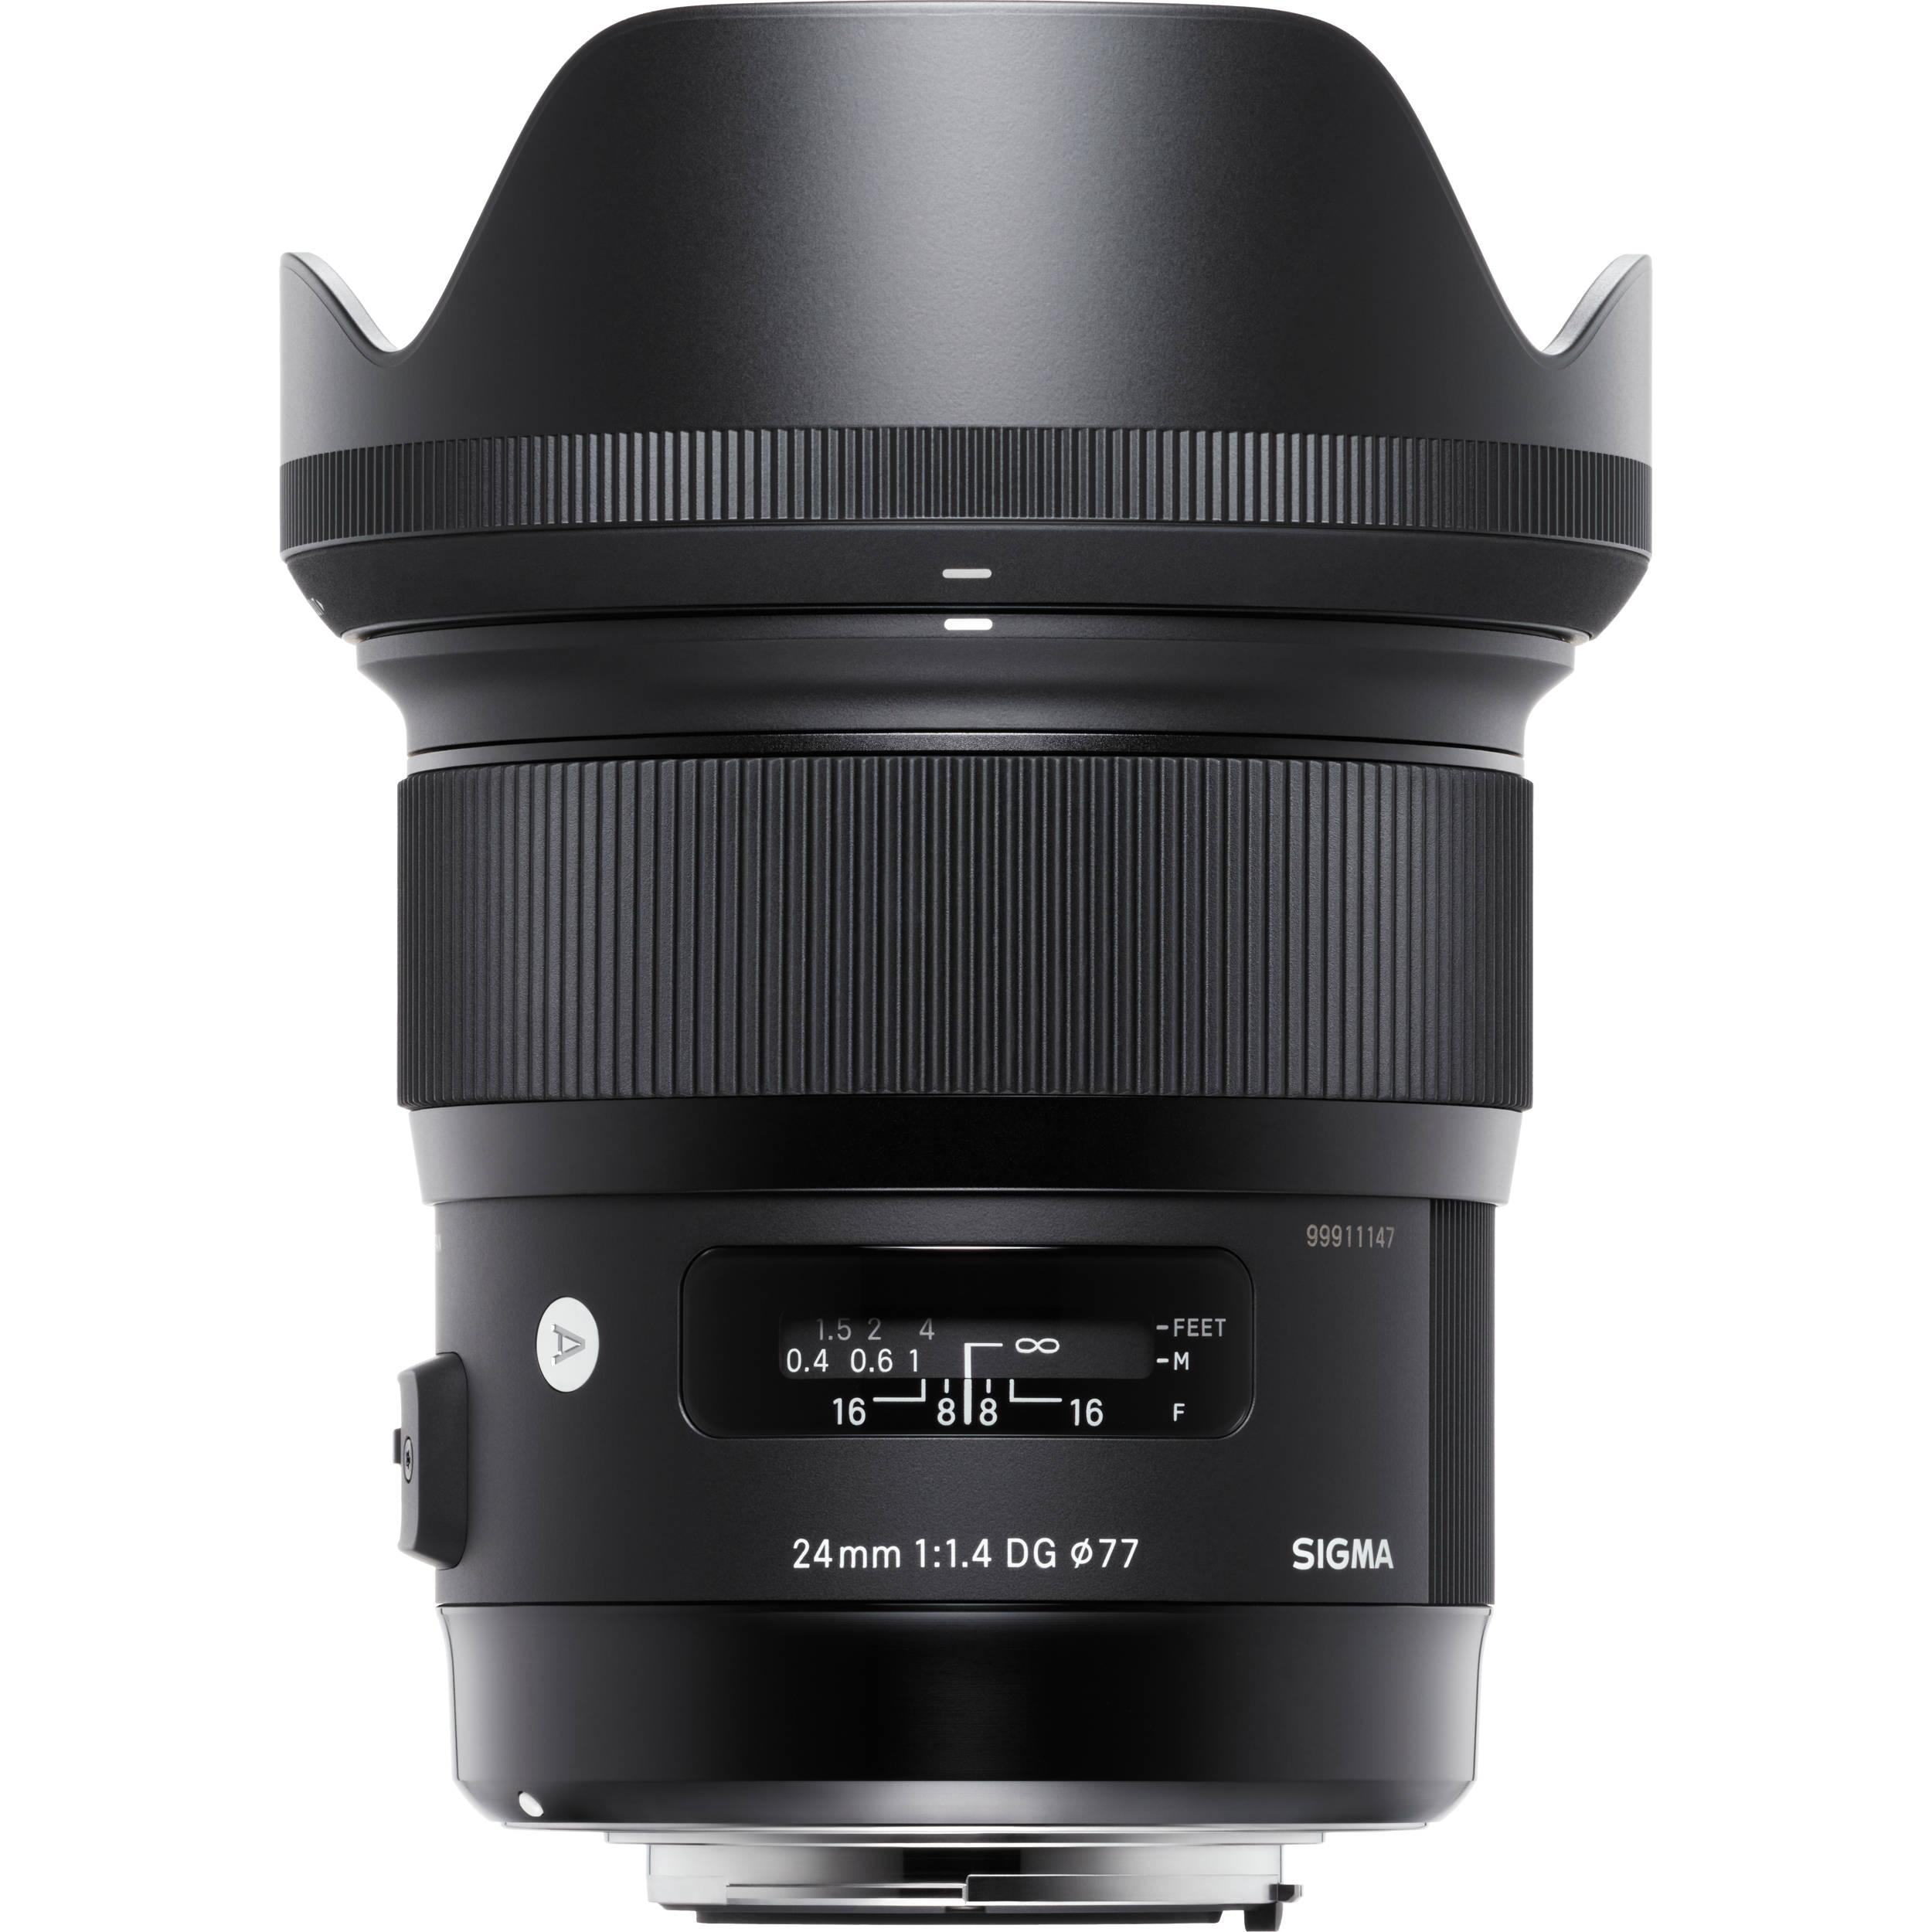 Sigma 24mm F 14 Dg Hsm Art Lens For Canon Ef 401 101 Bh Photo Screw Baut Pc Komputer T6 Casing Alternate Mount Shown